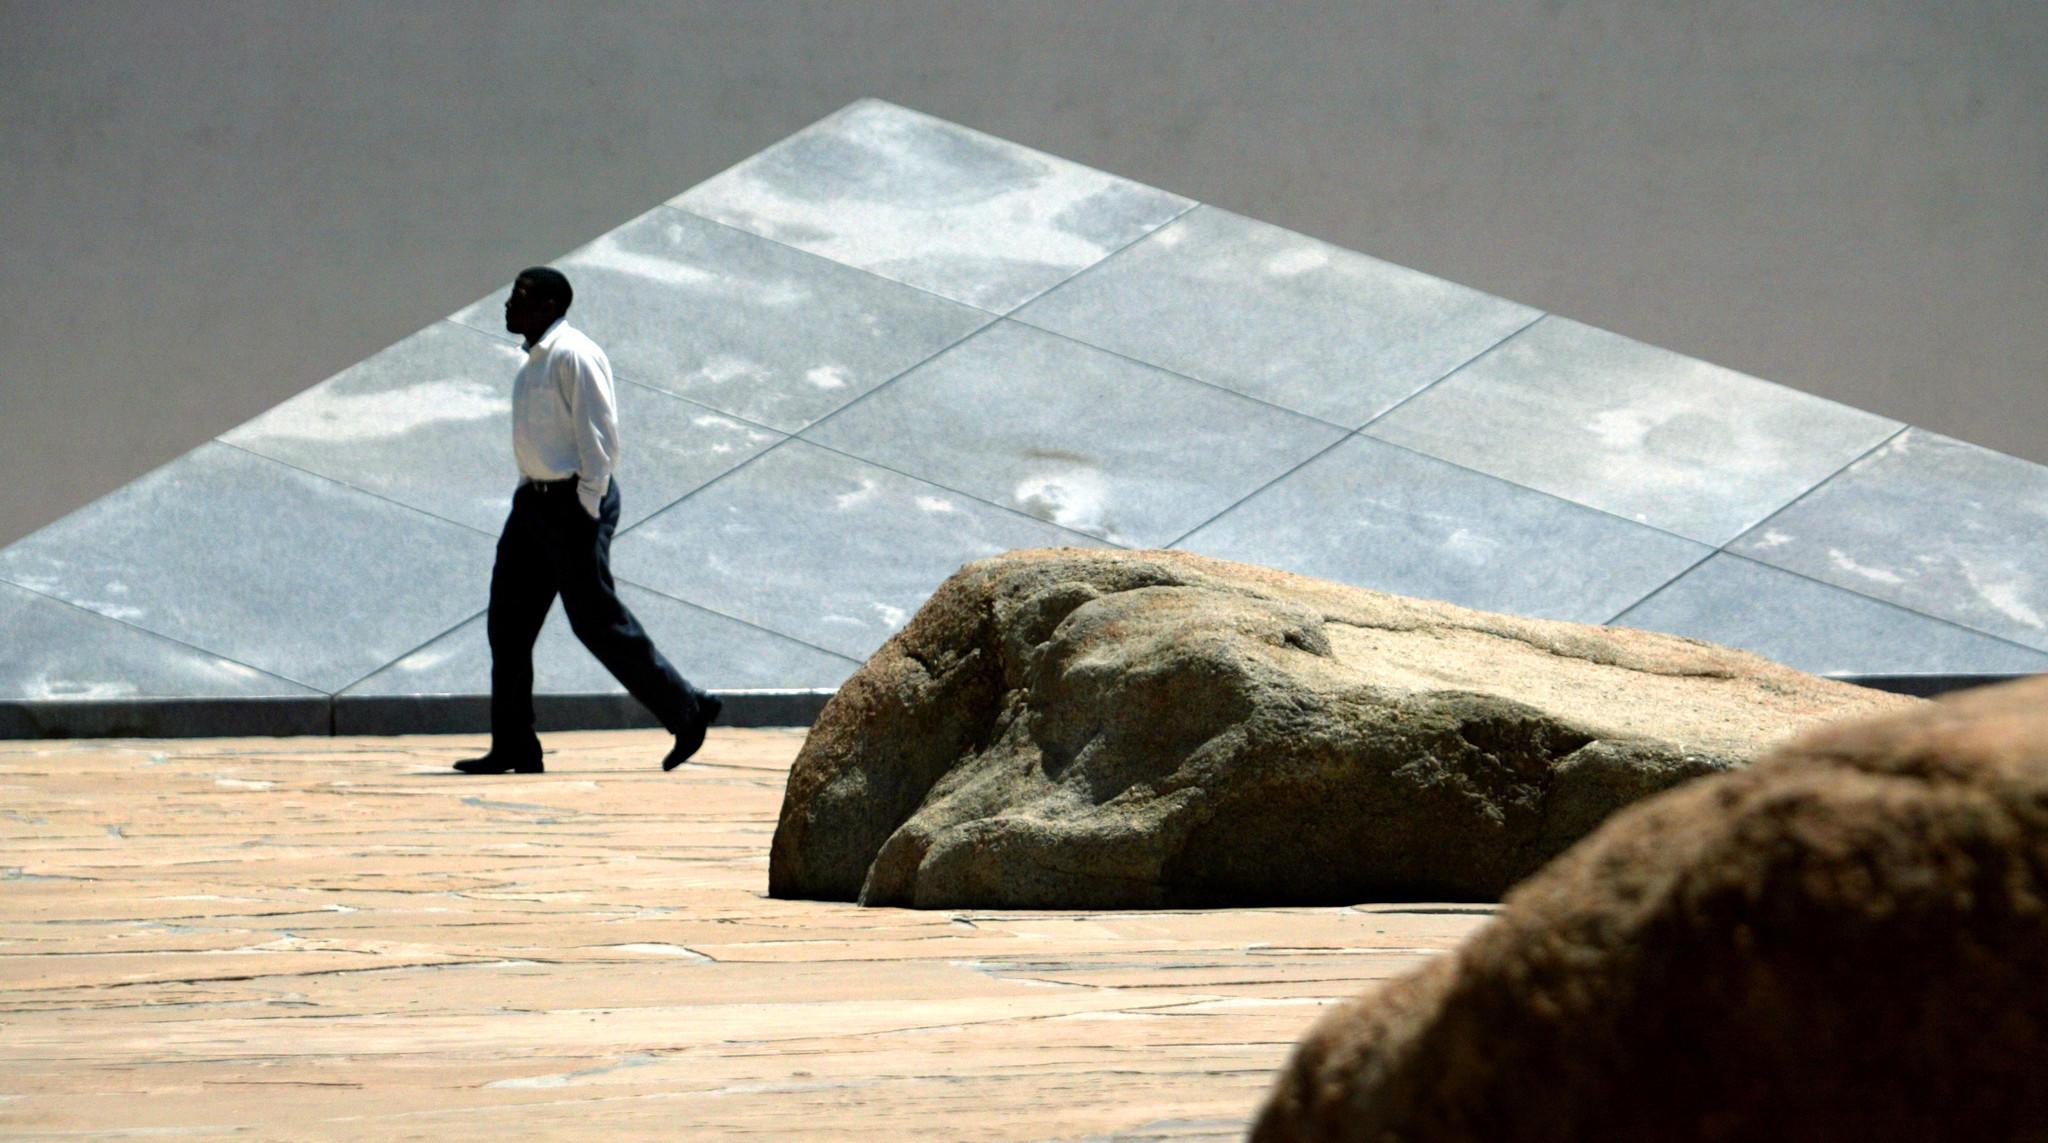 Isamu Noguchi's famous stone sculpture garden in Costa Mesa.